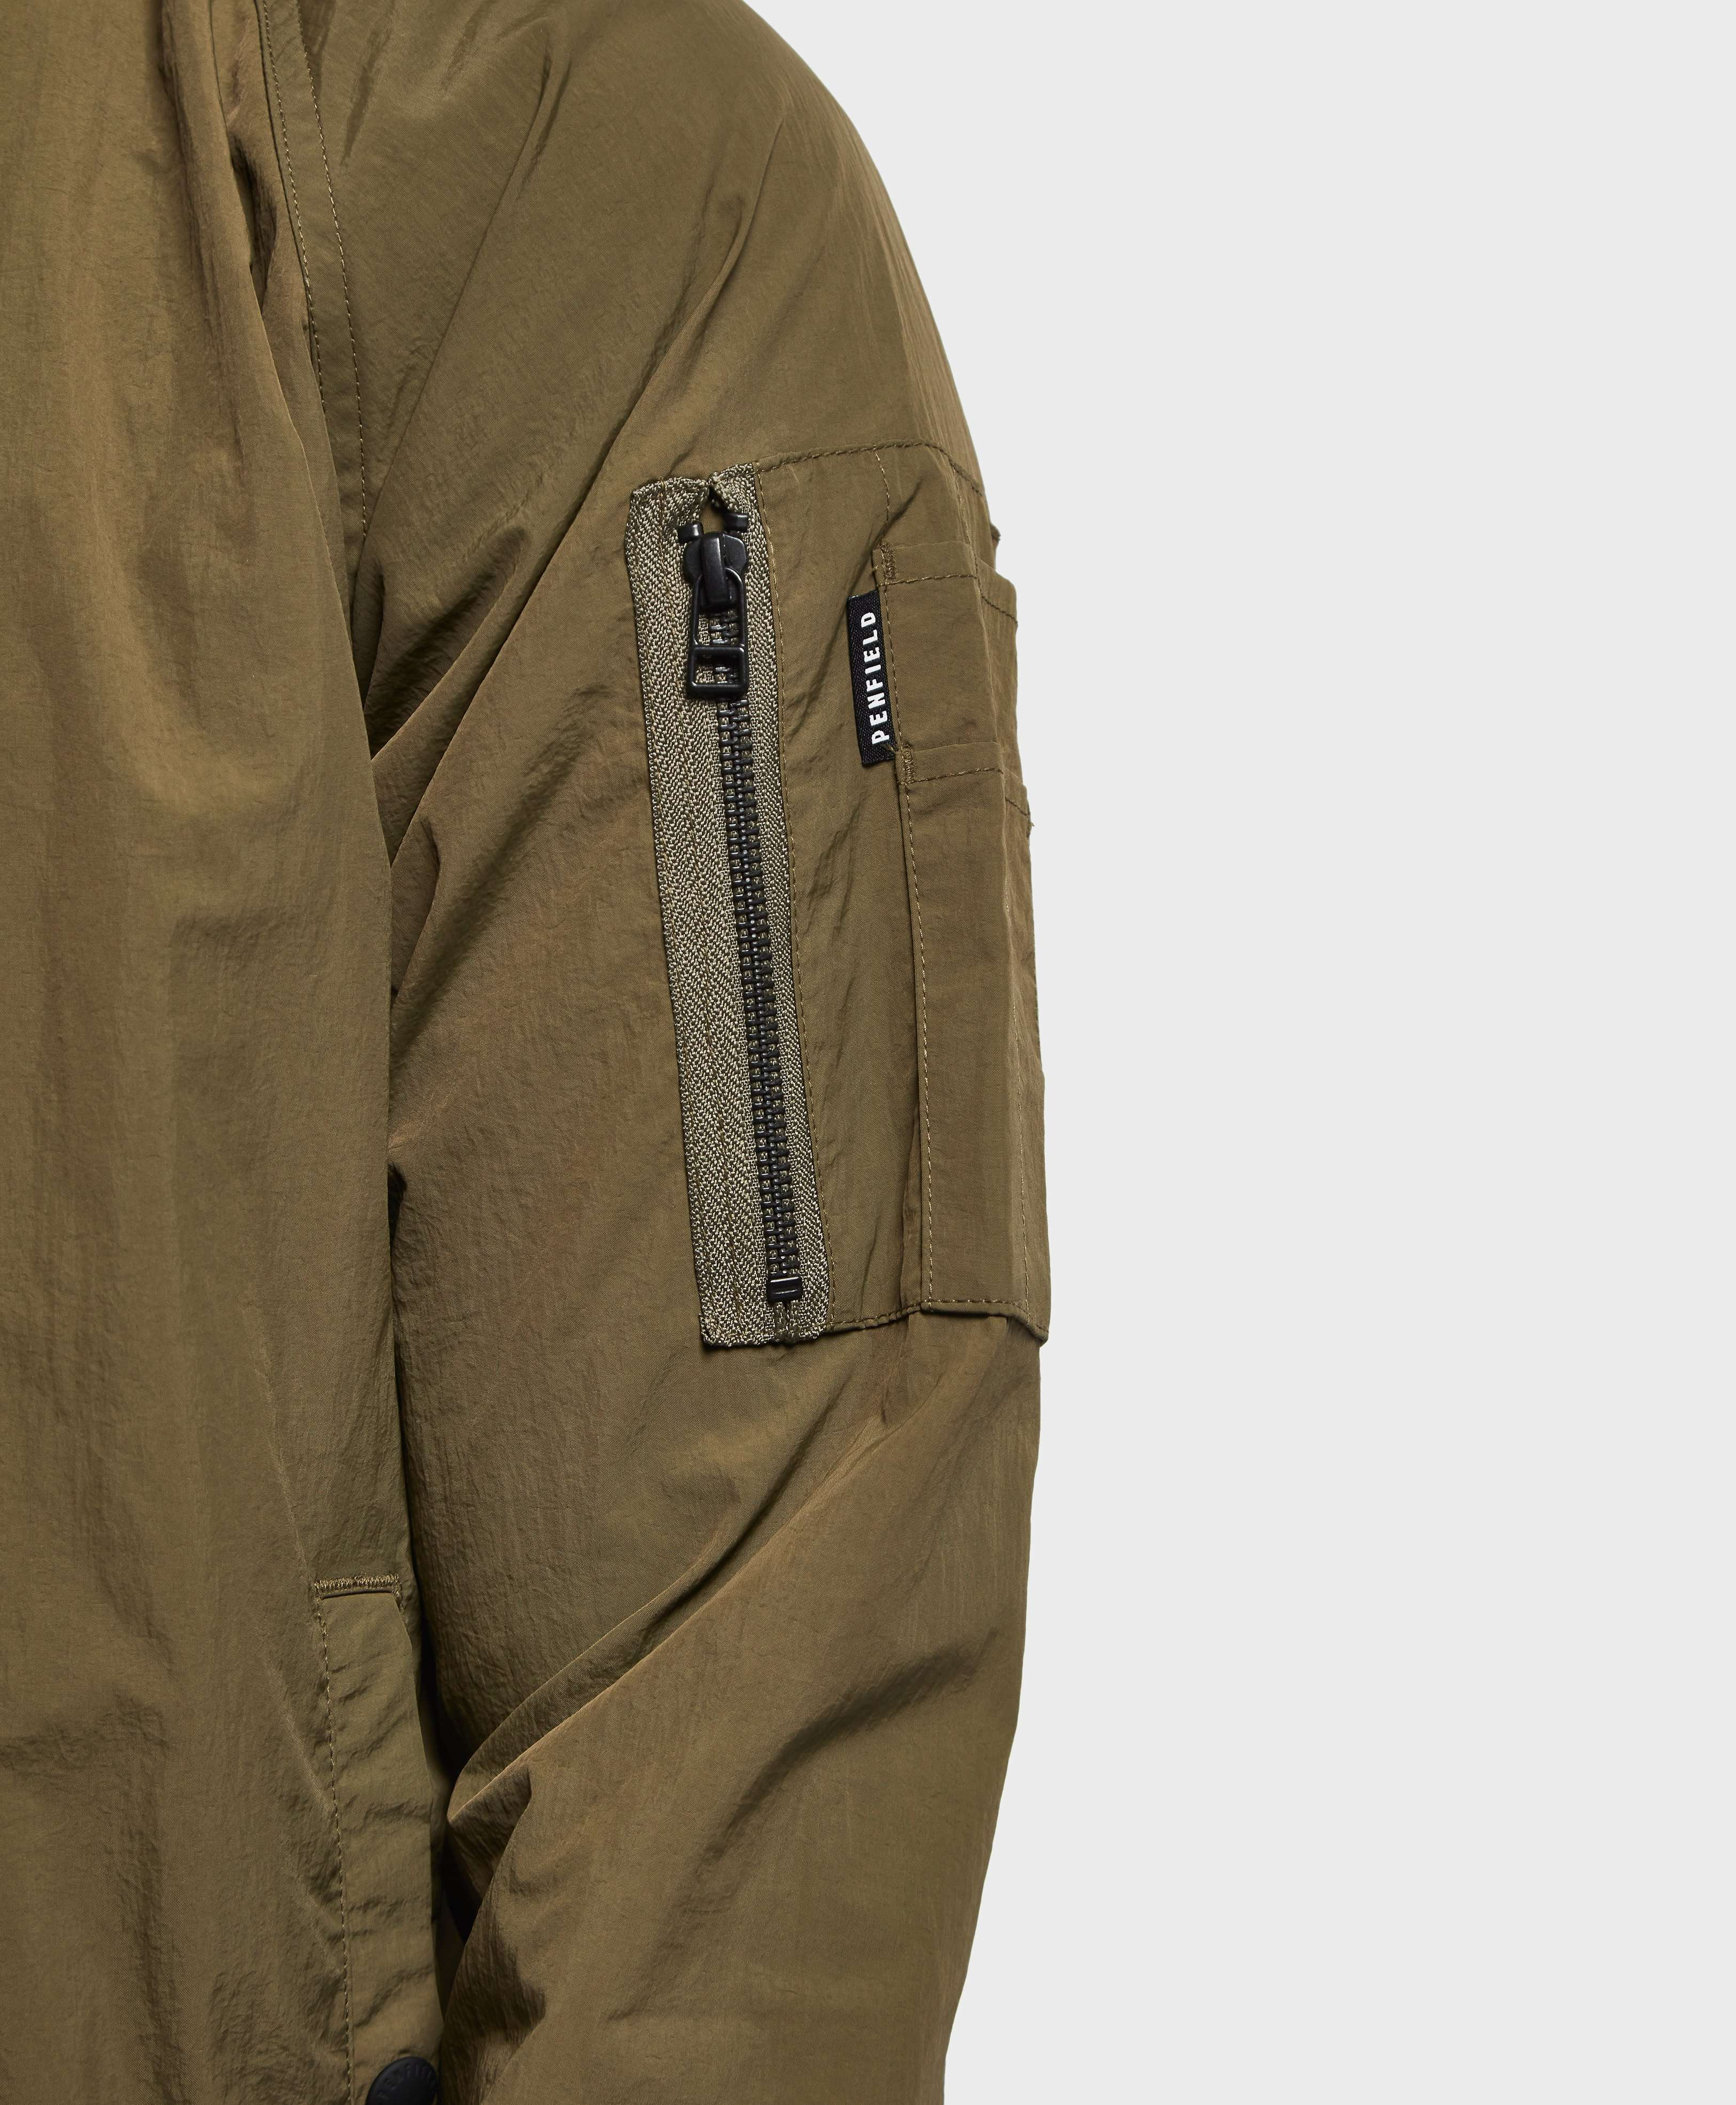 Penfield Okenfield Lightweight Bomber Jacket